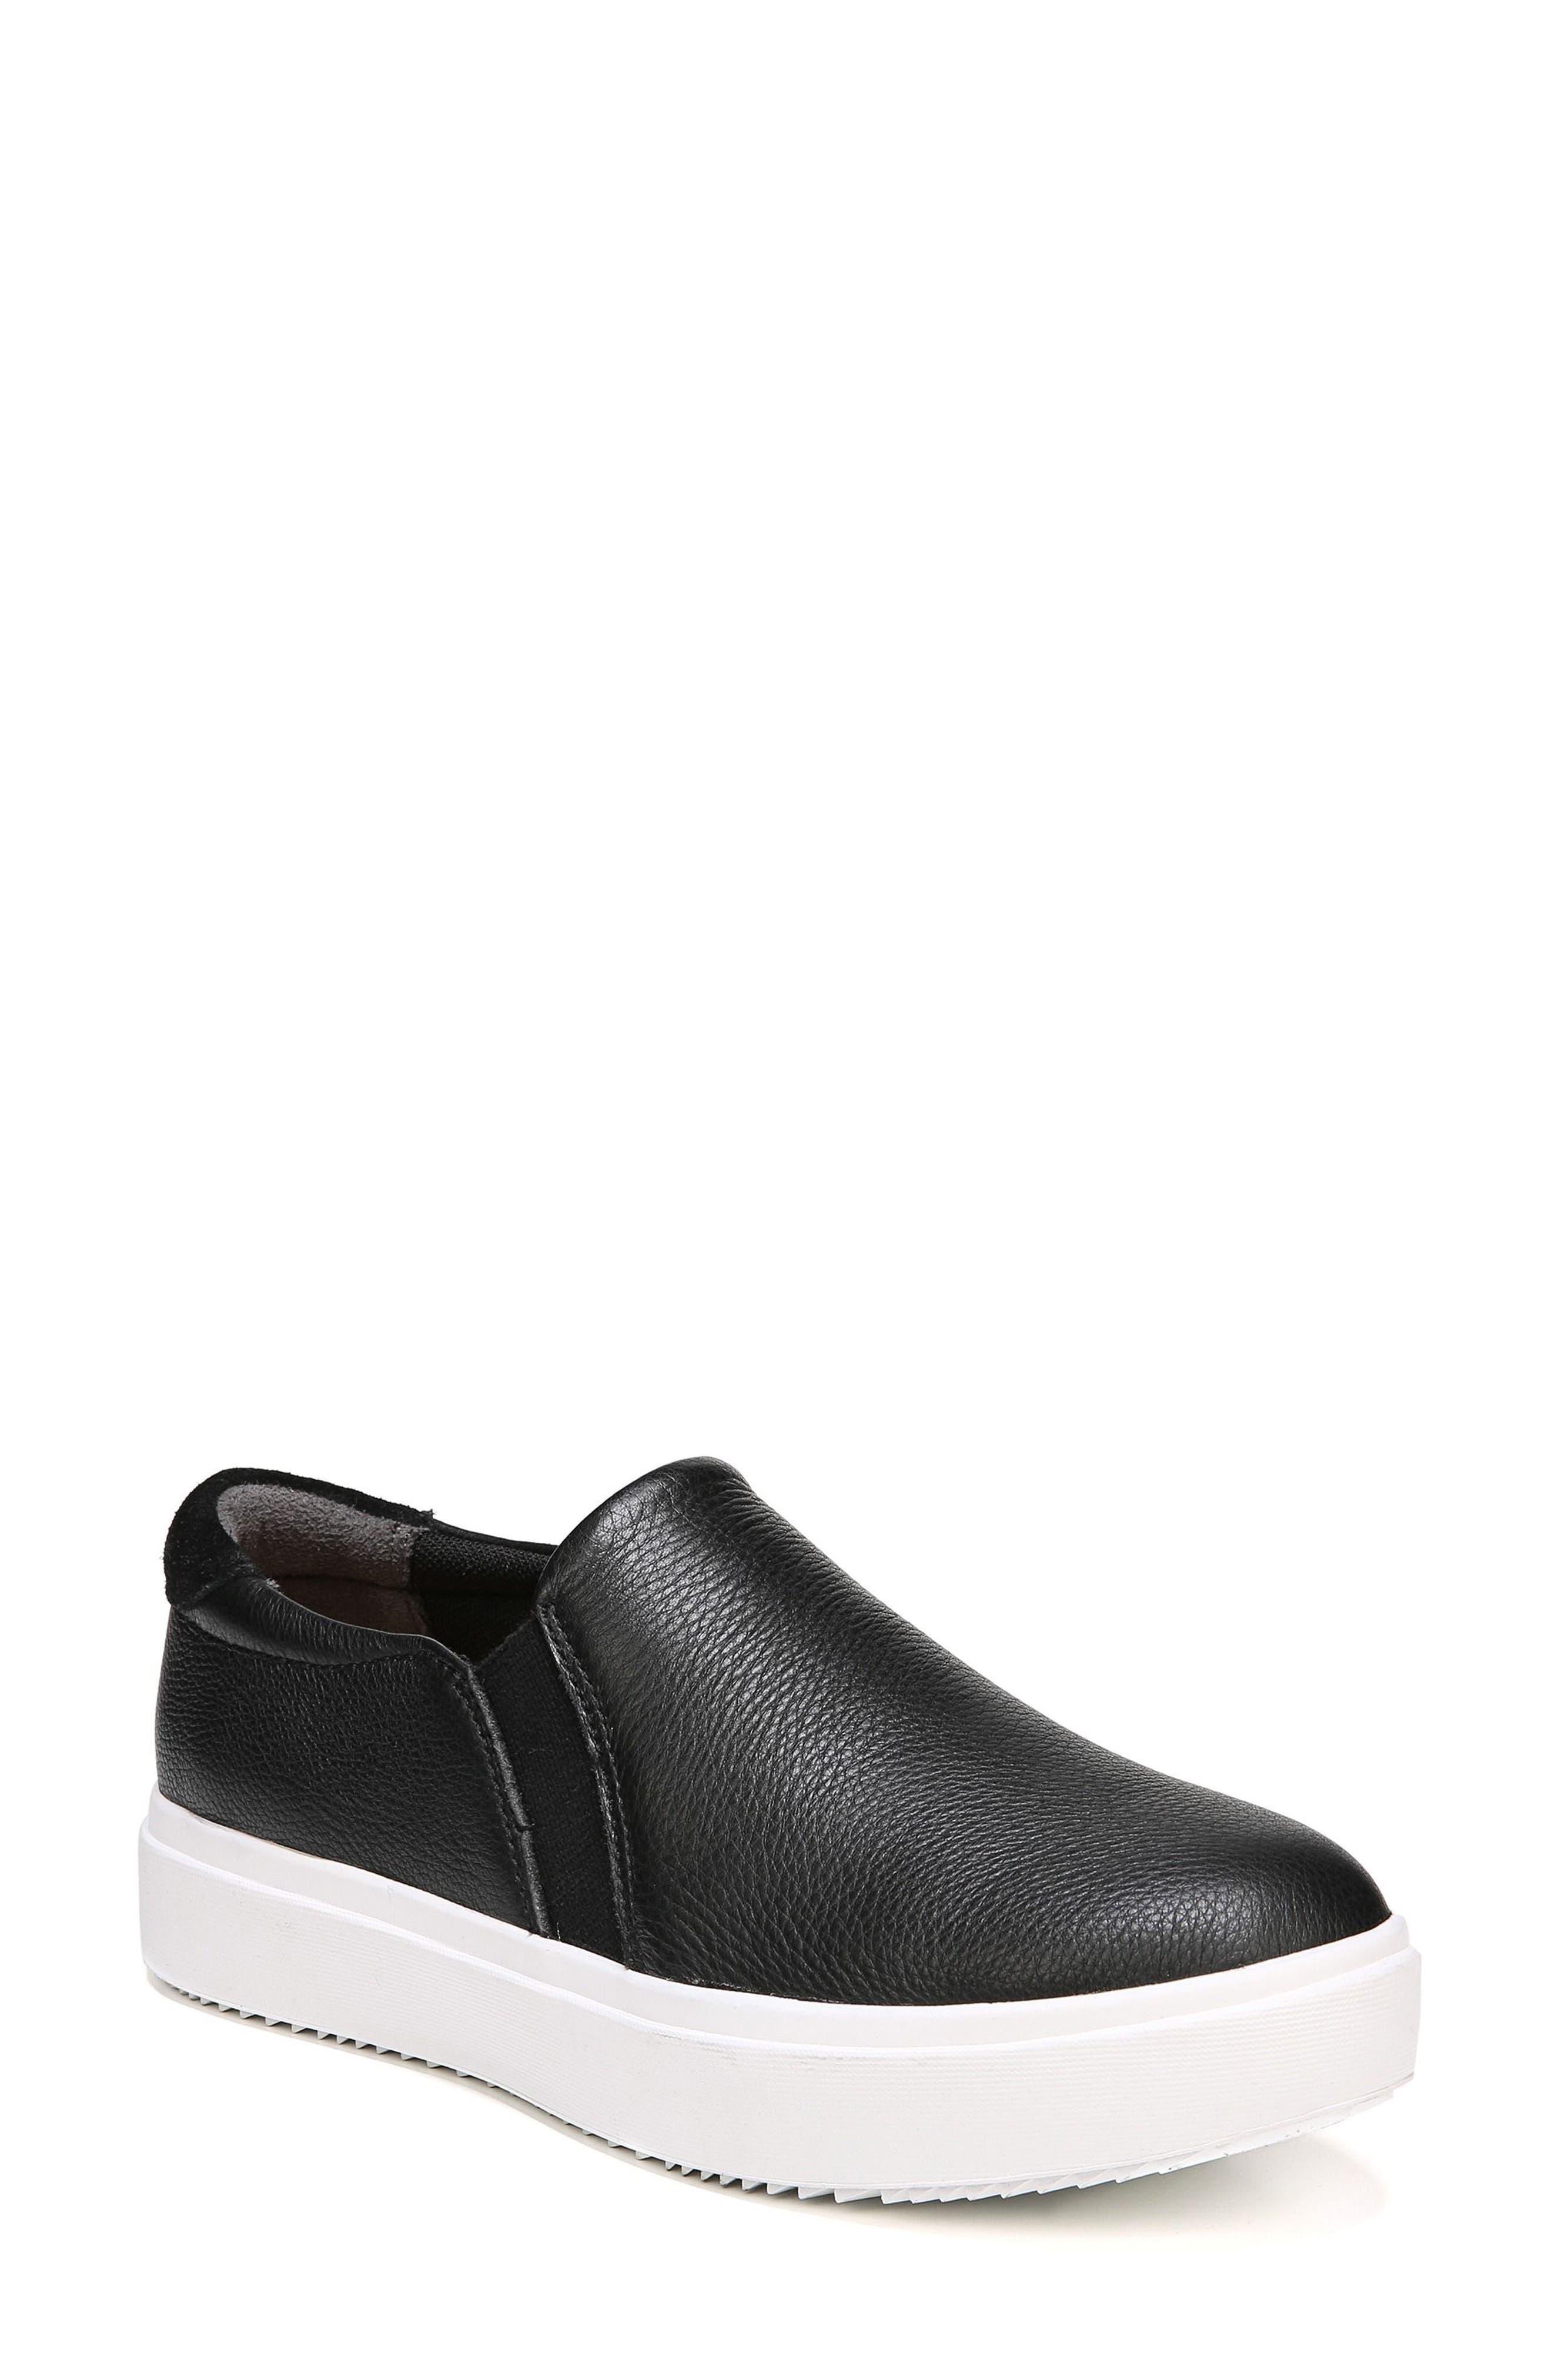 DR. SCHOLL'S, Leta Slip-On Sneaker, Main thumbnail 1, color, BLACK LEATHER